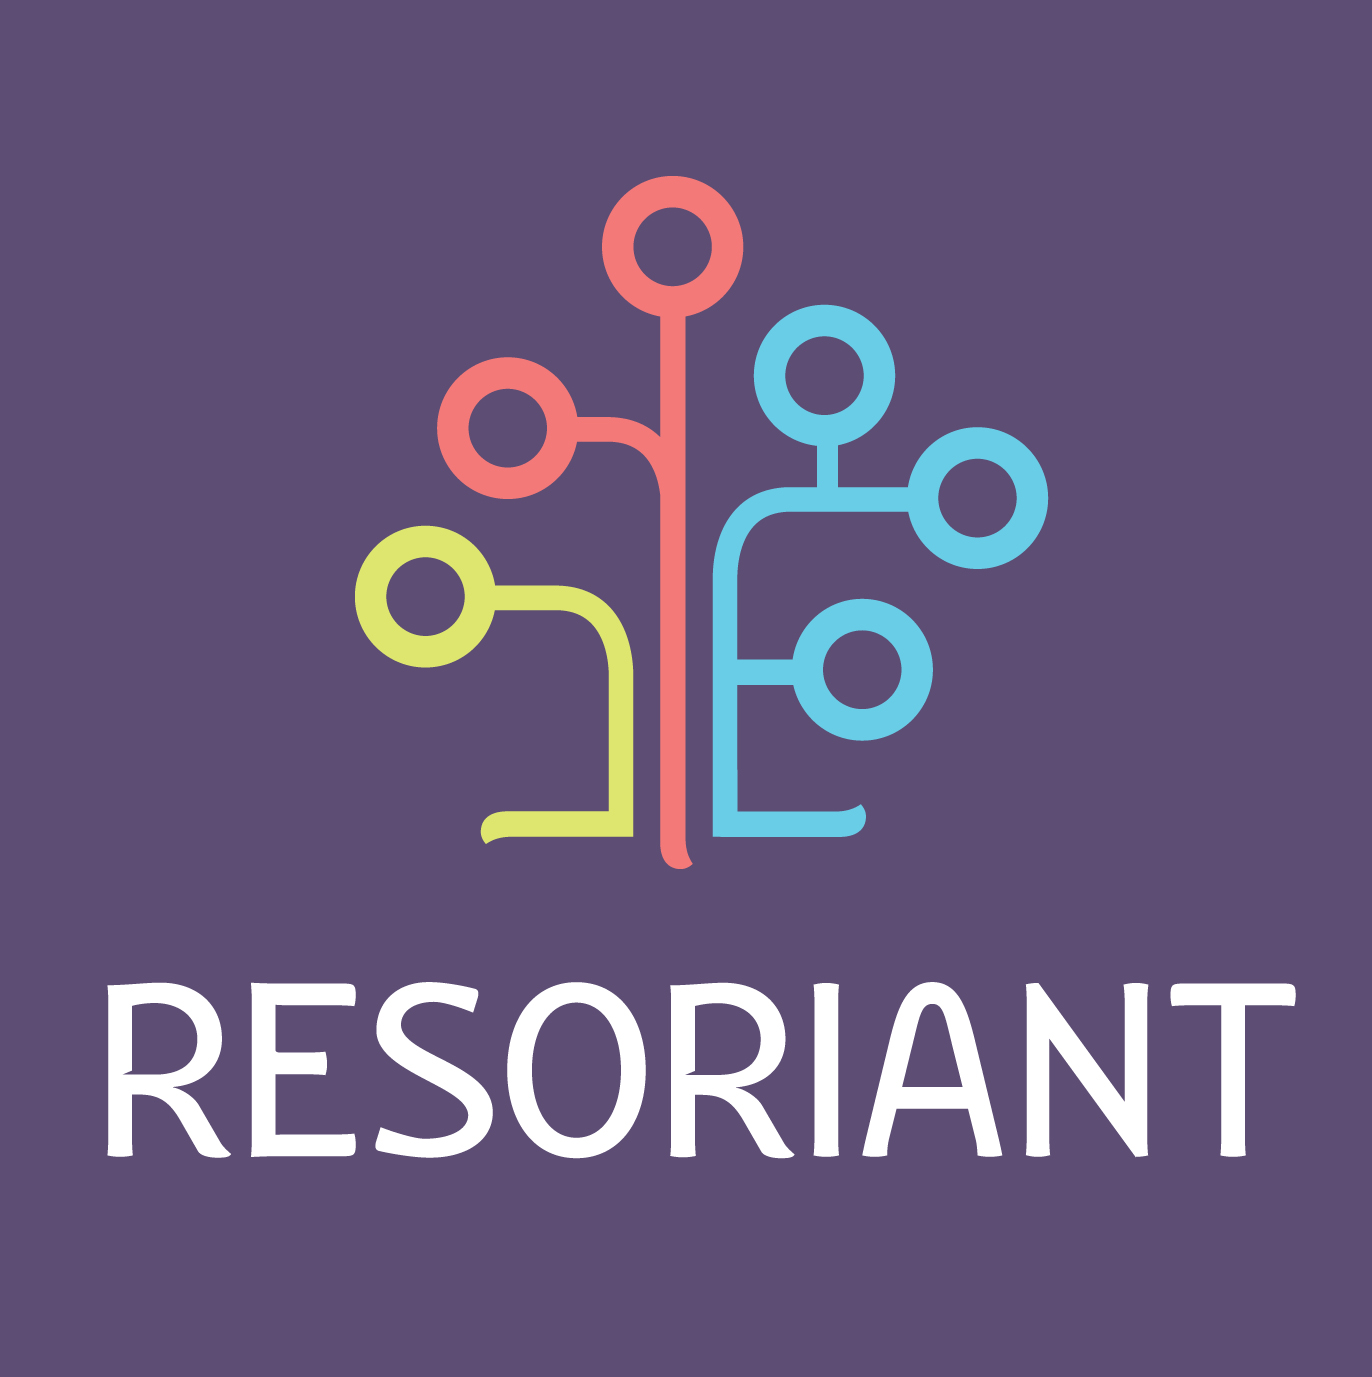 RESORIANT - logo